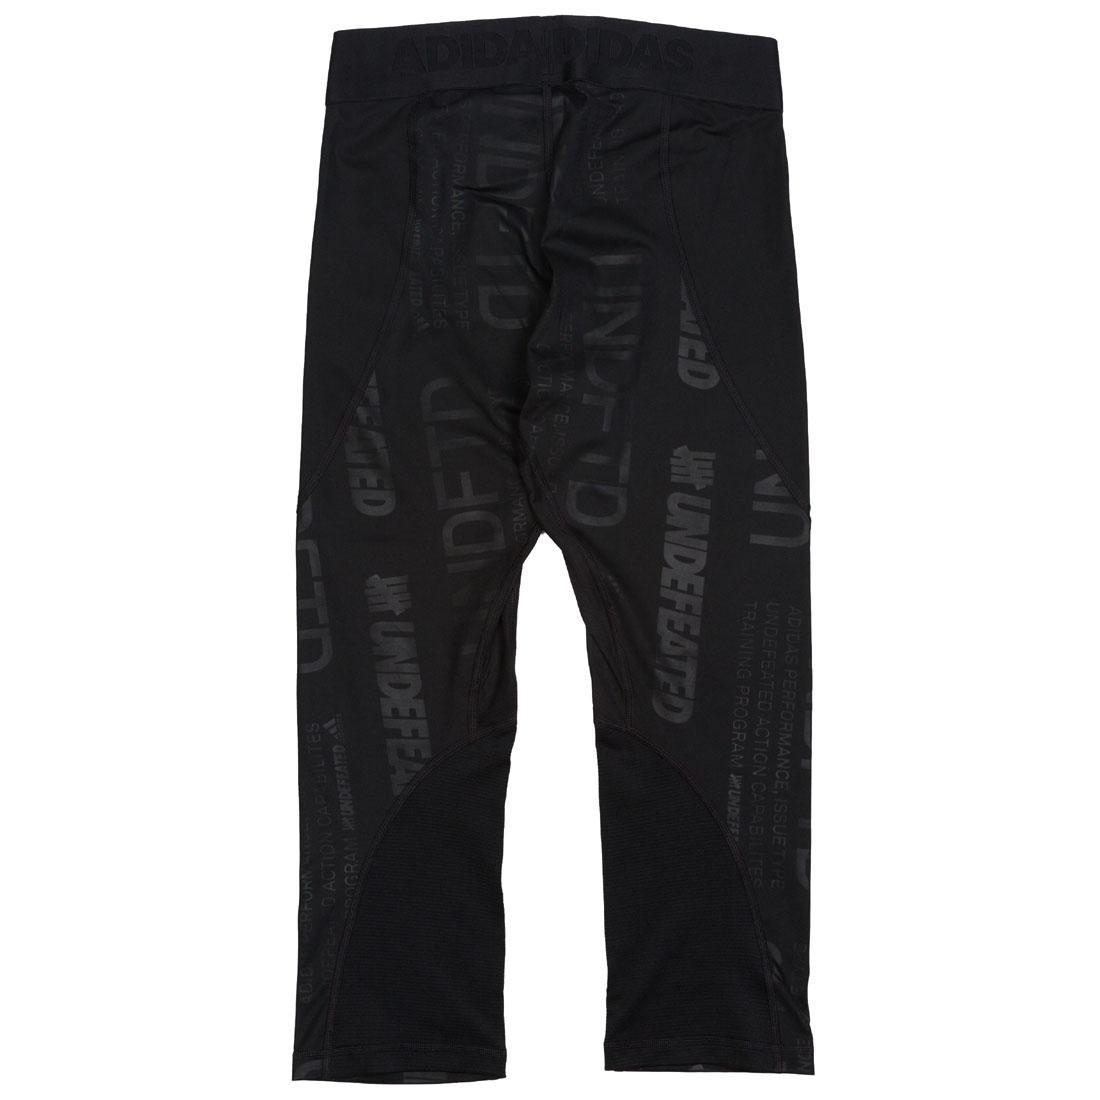 5edd7428cdd7 Adidas x Undefeated Men Alphaskin Tech 3 4 Tights (black)